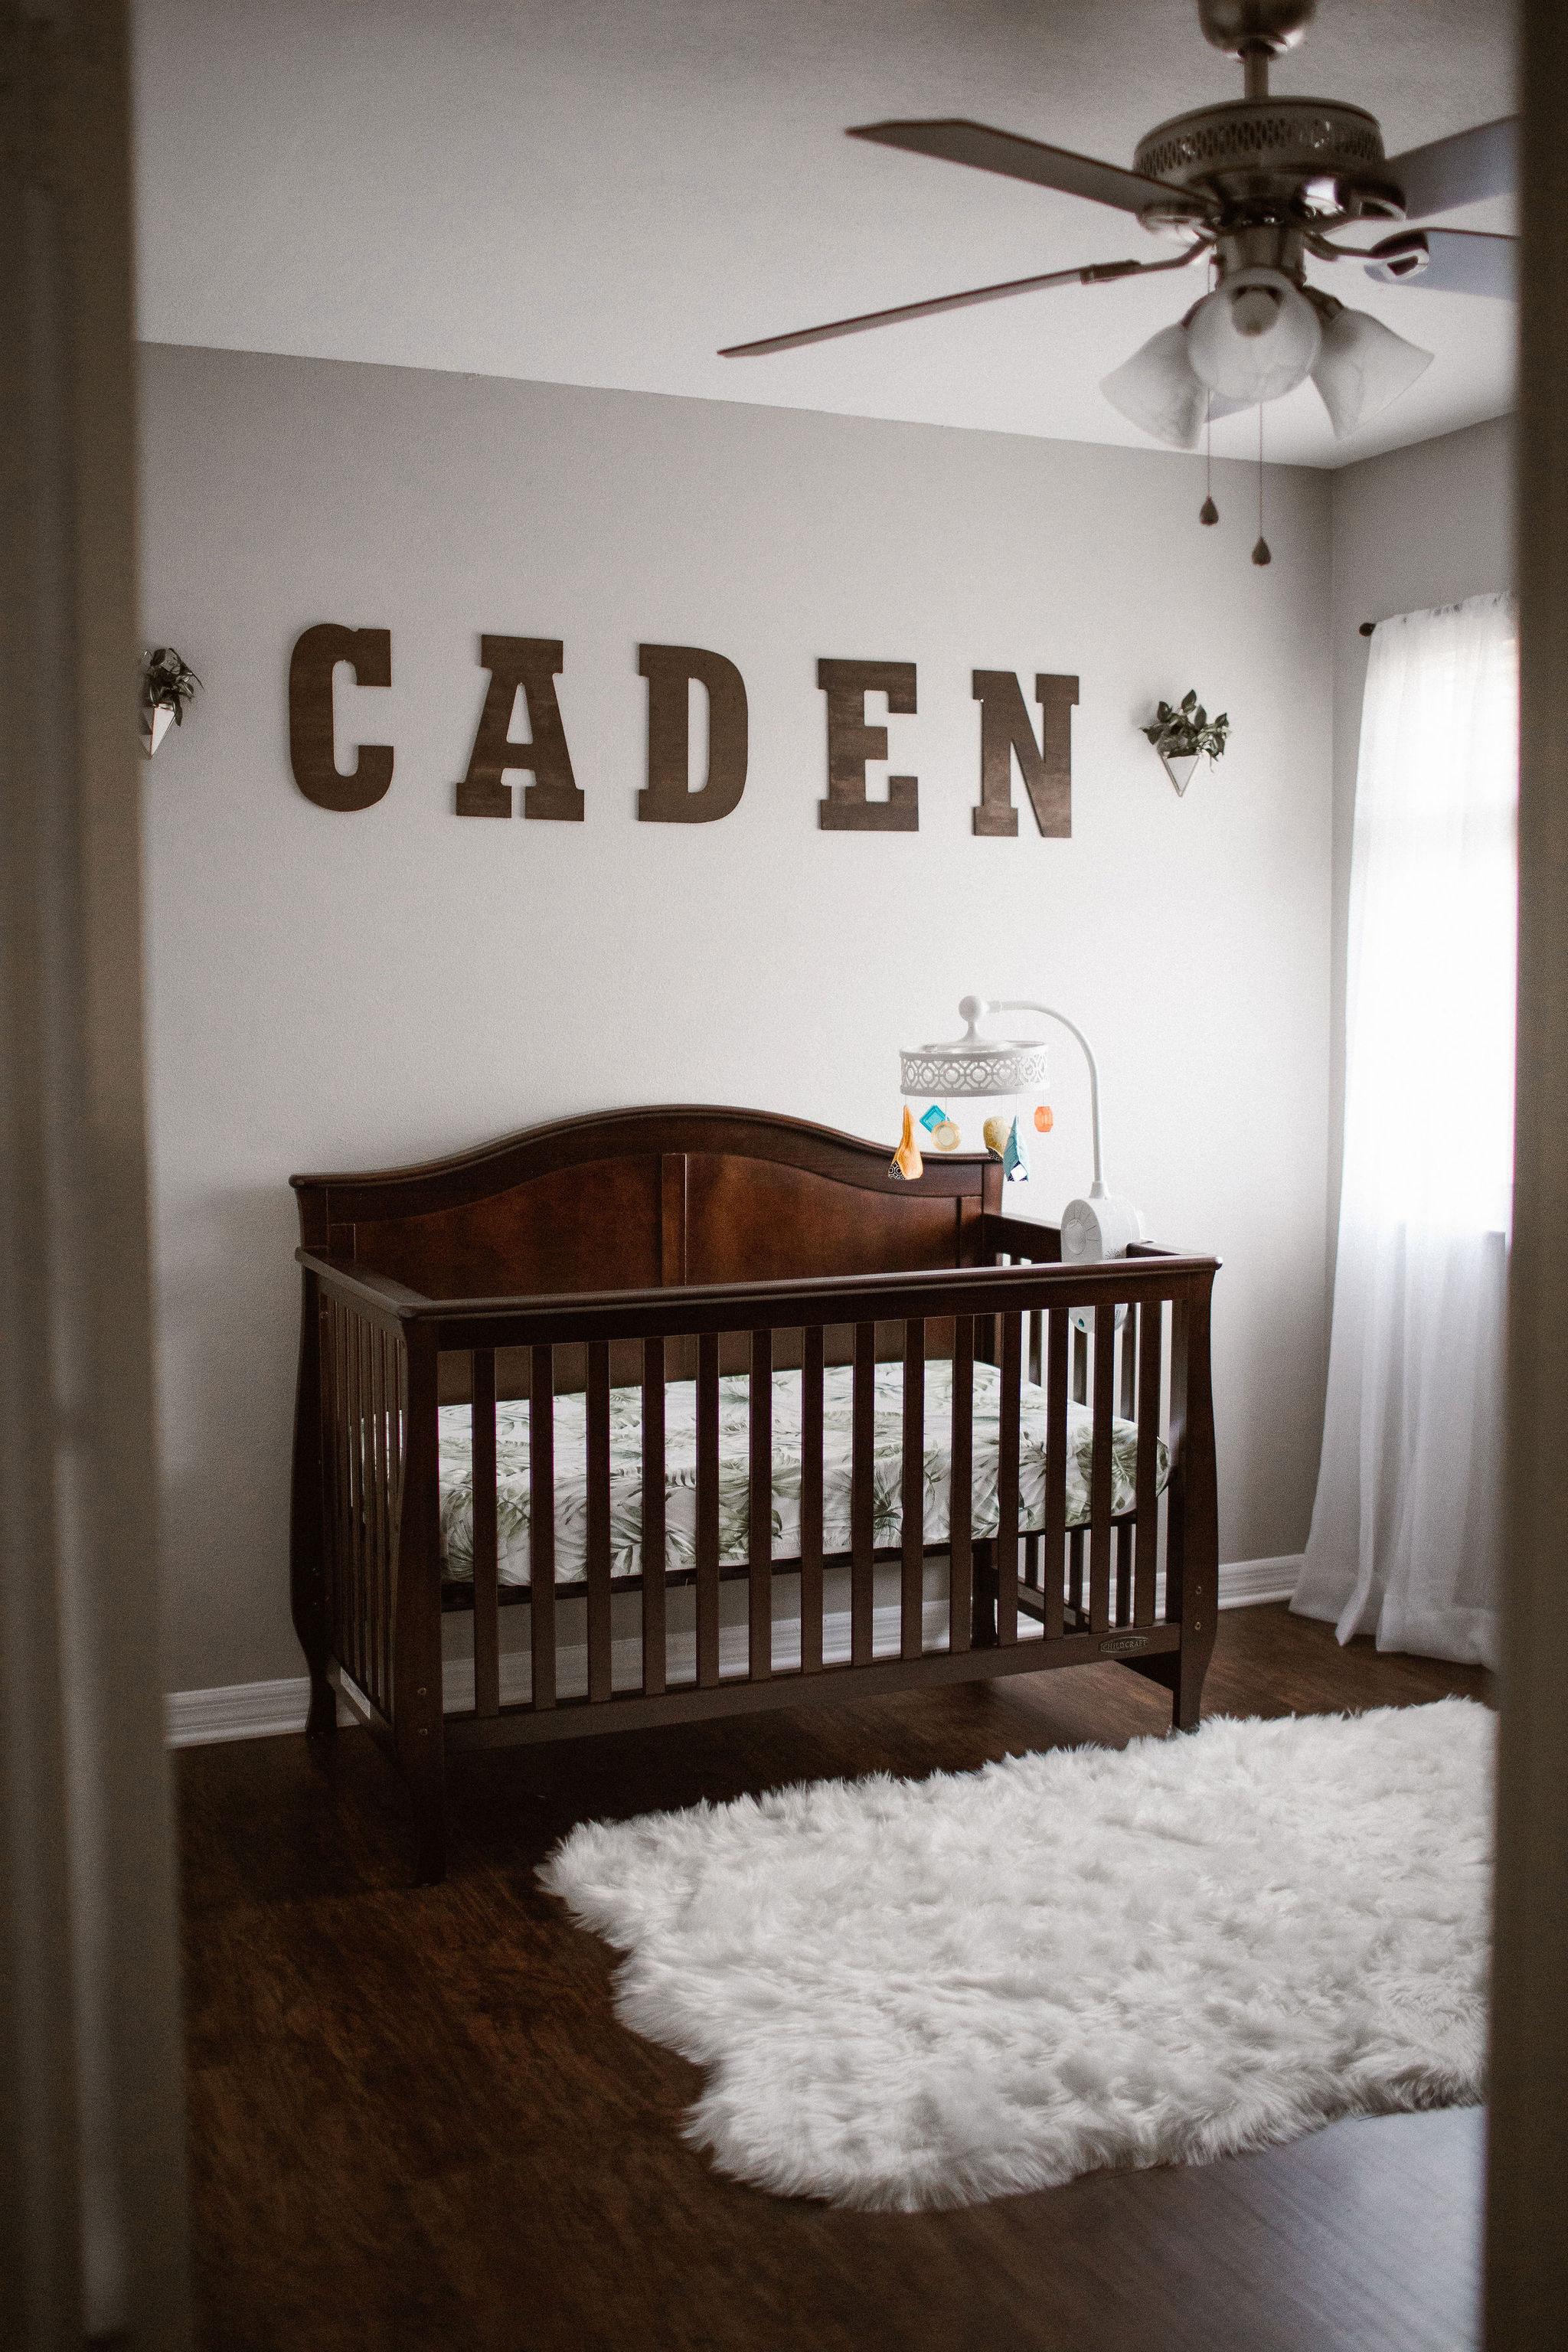 cadennewborn_2.jpg